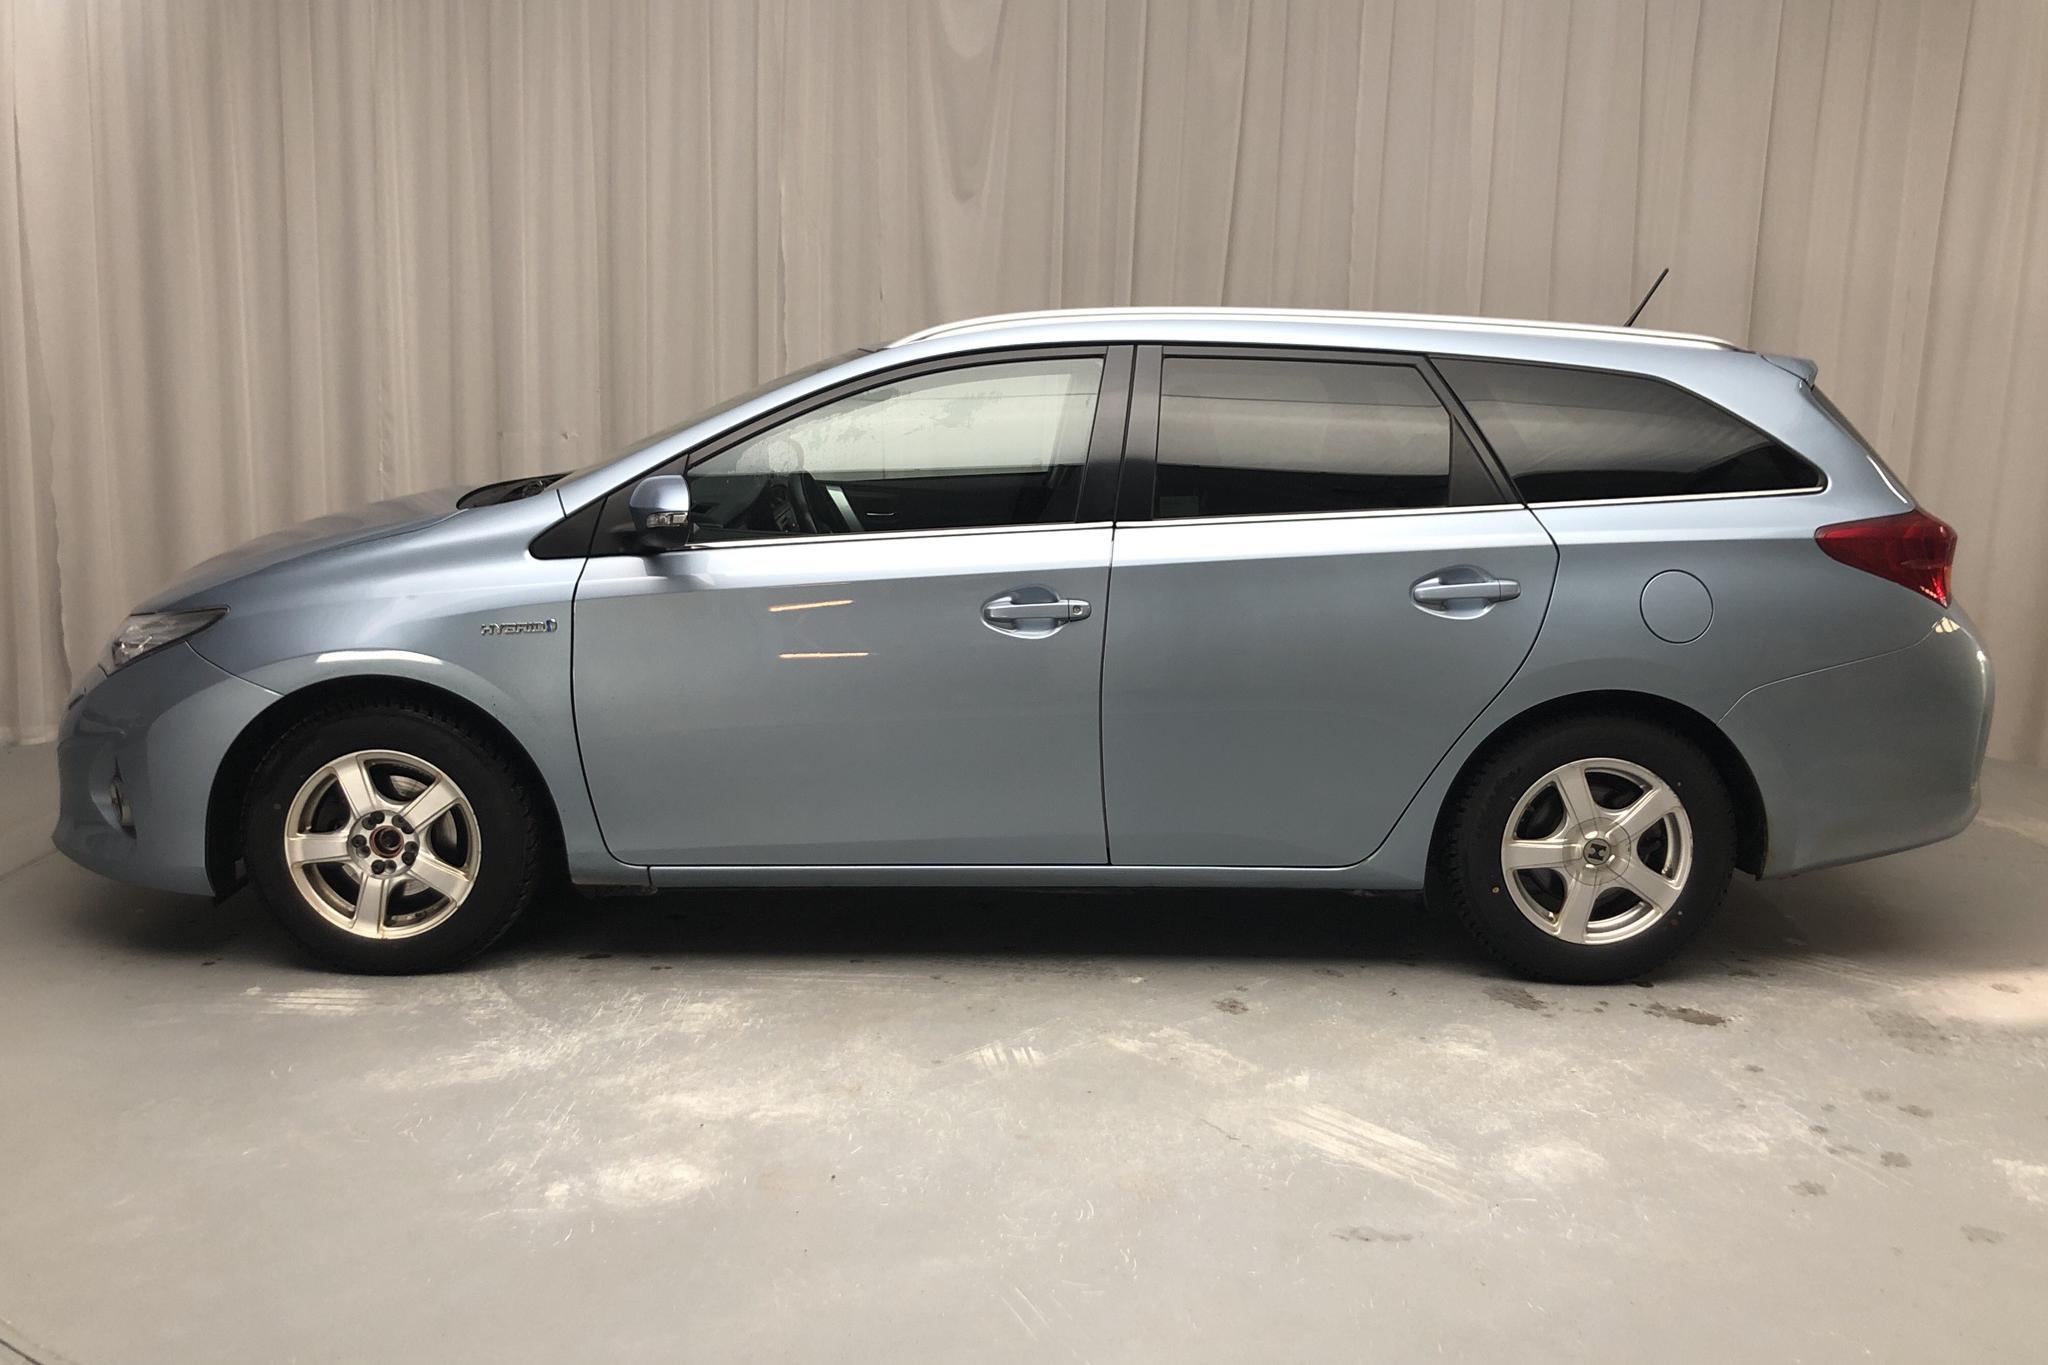 Toyota Auris 1.8 HSD Touring Sports (99hk) - 22 482 mil - Automat - Light Blue - 2015